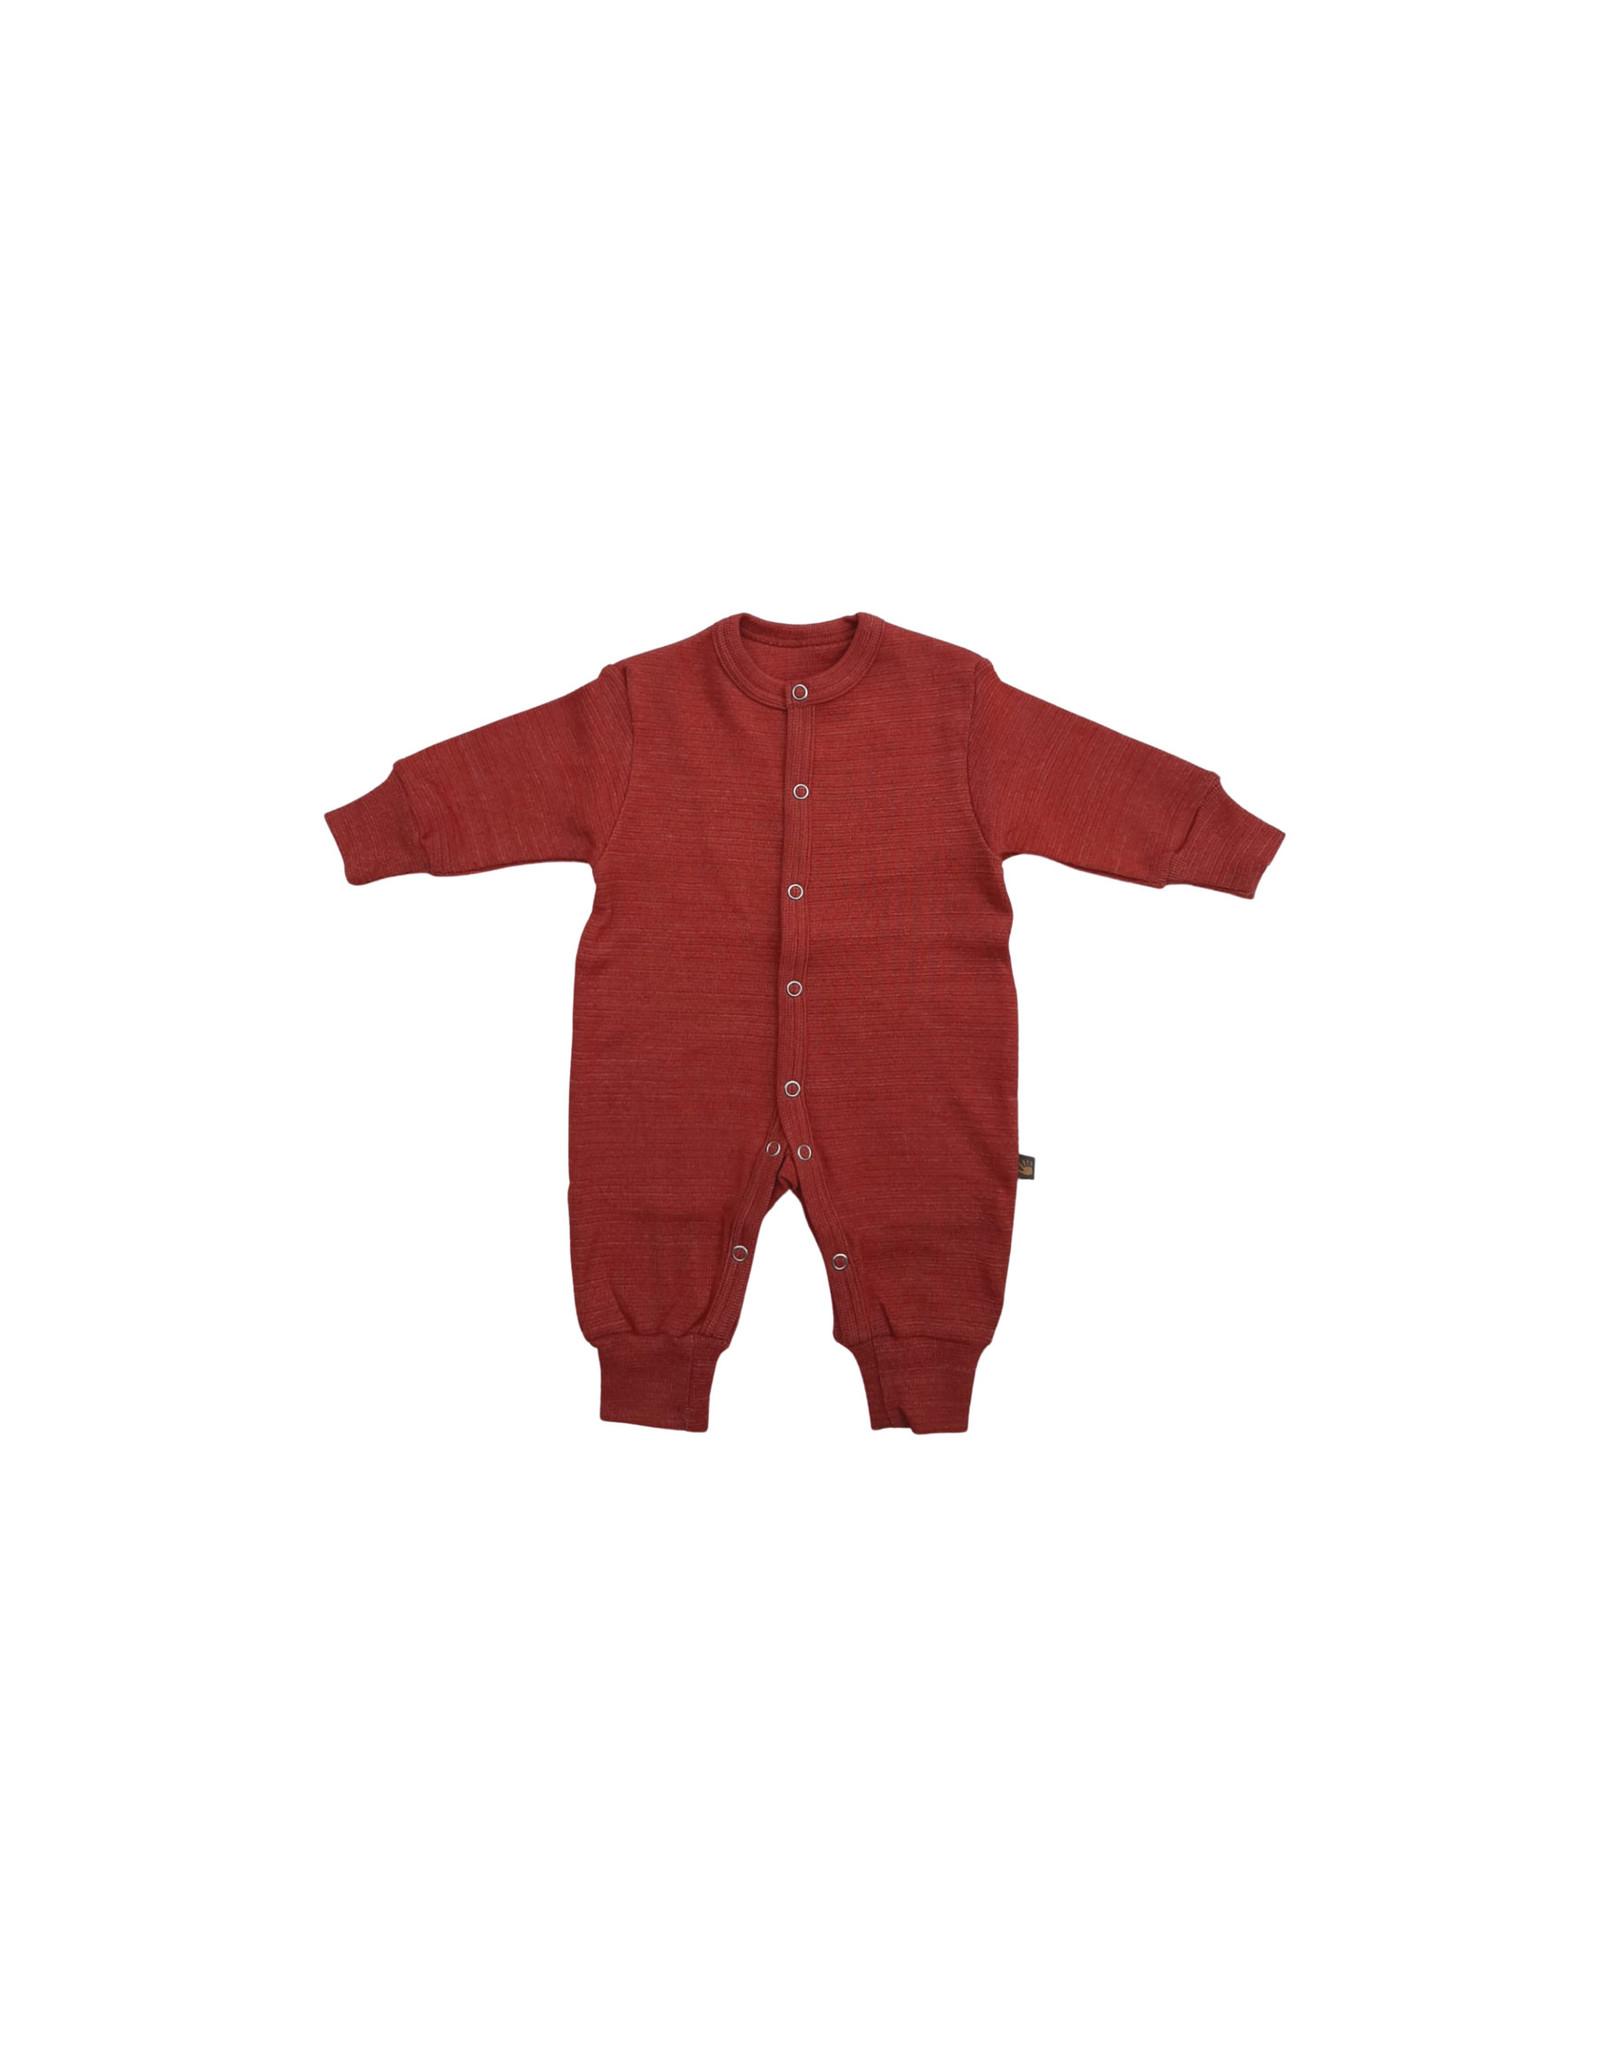 Forgaminnt Forgaminnt Pyjama Zonder Voetjes Bossa Nova